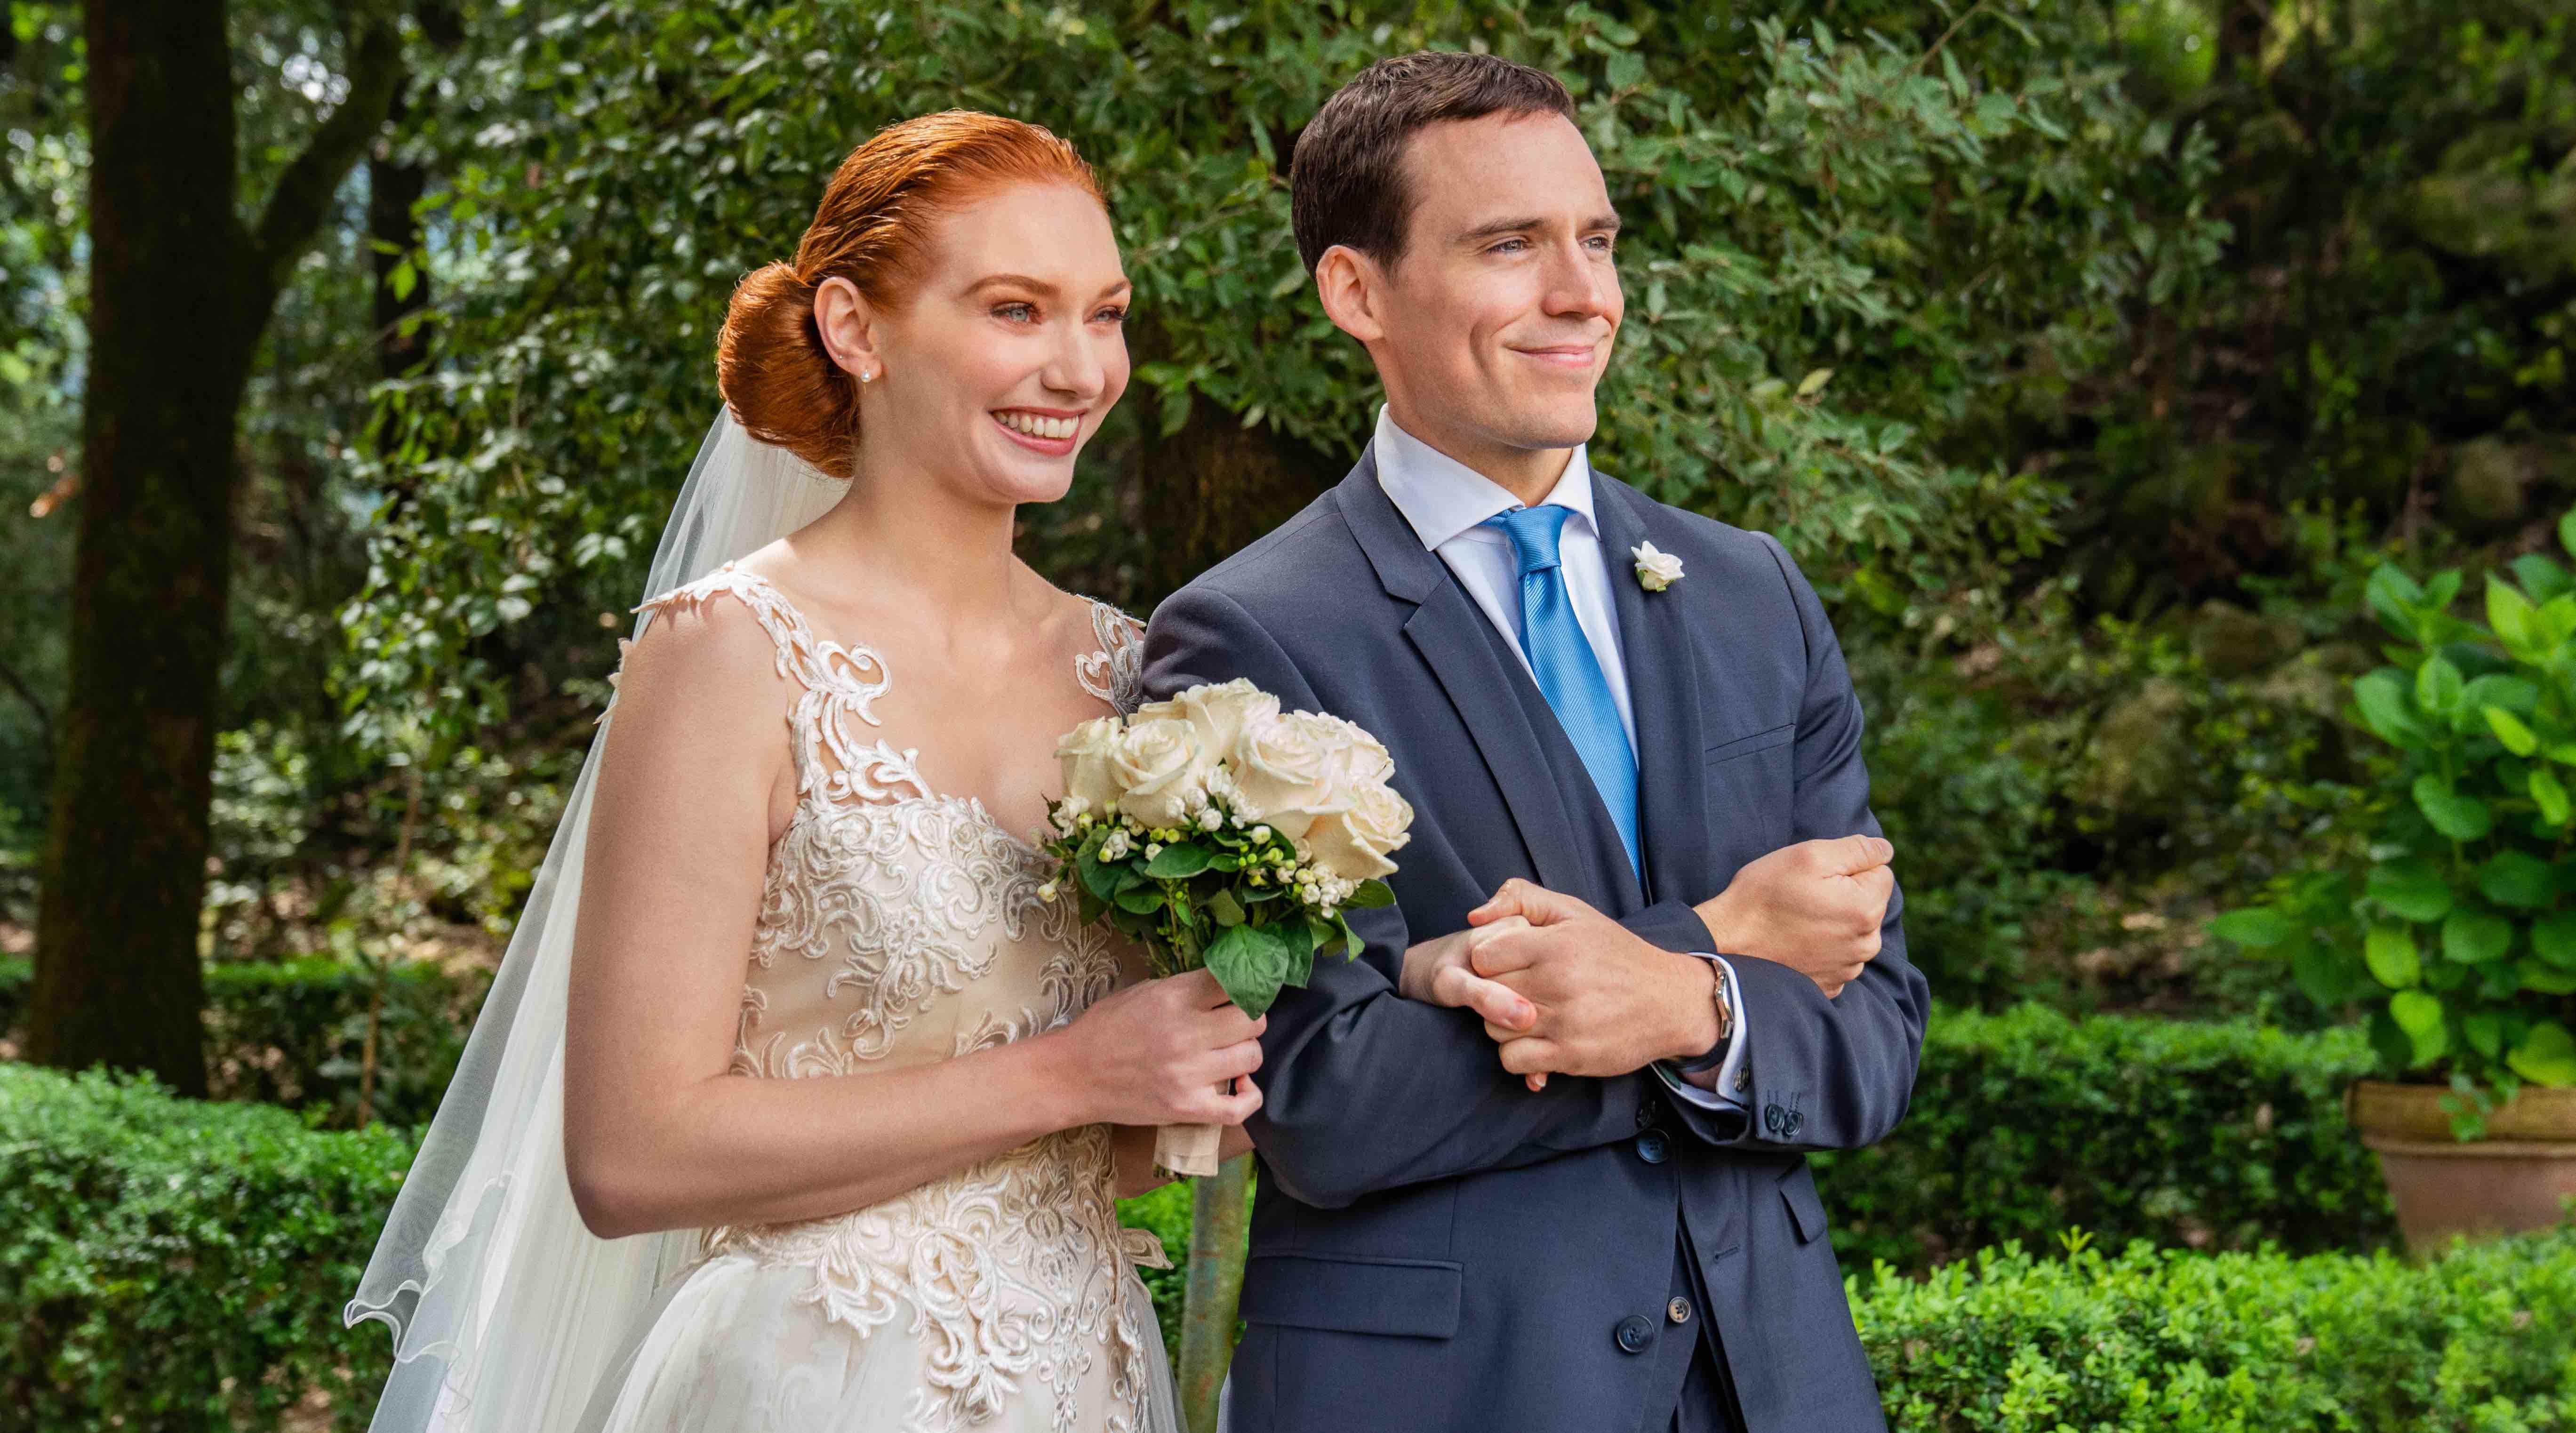 Love Wedding Repeat 2020 Imdb